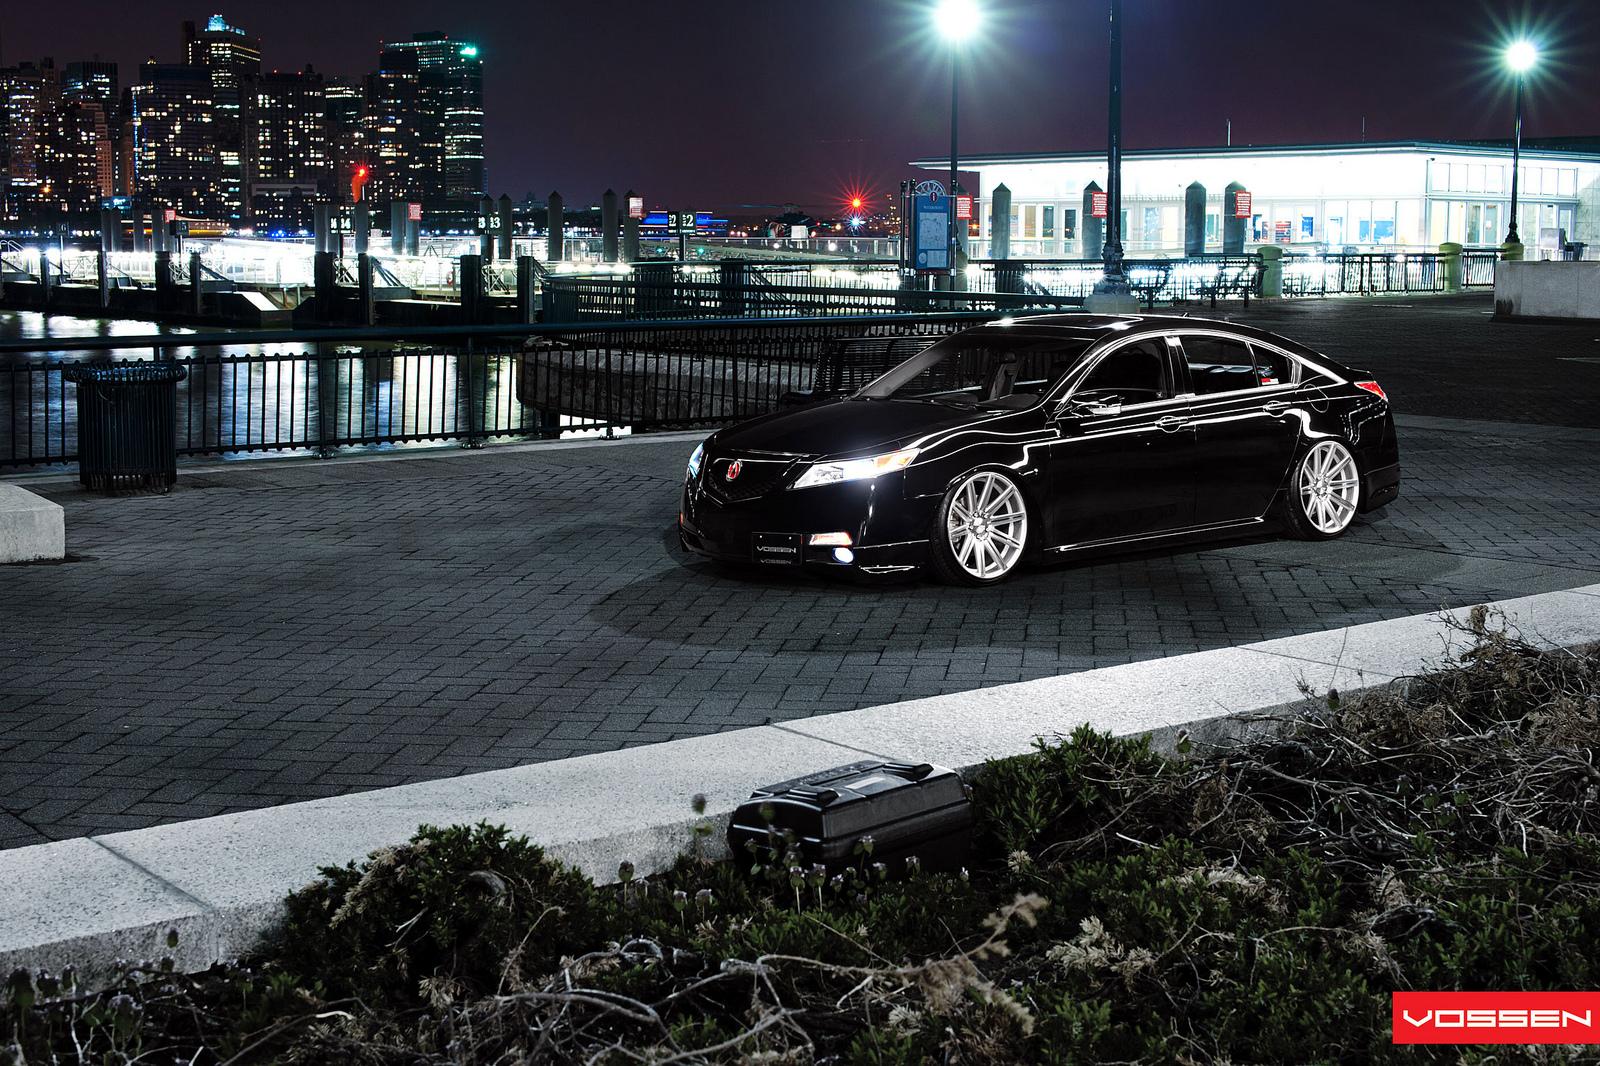 Acura Tl Lowrider On Vossen Wheels Photo Gallery